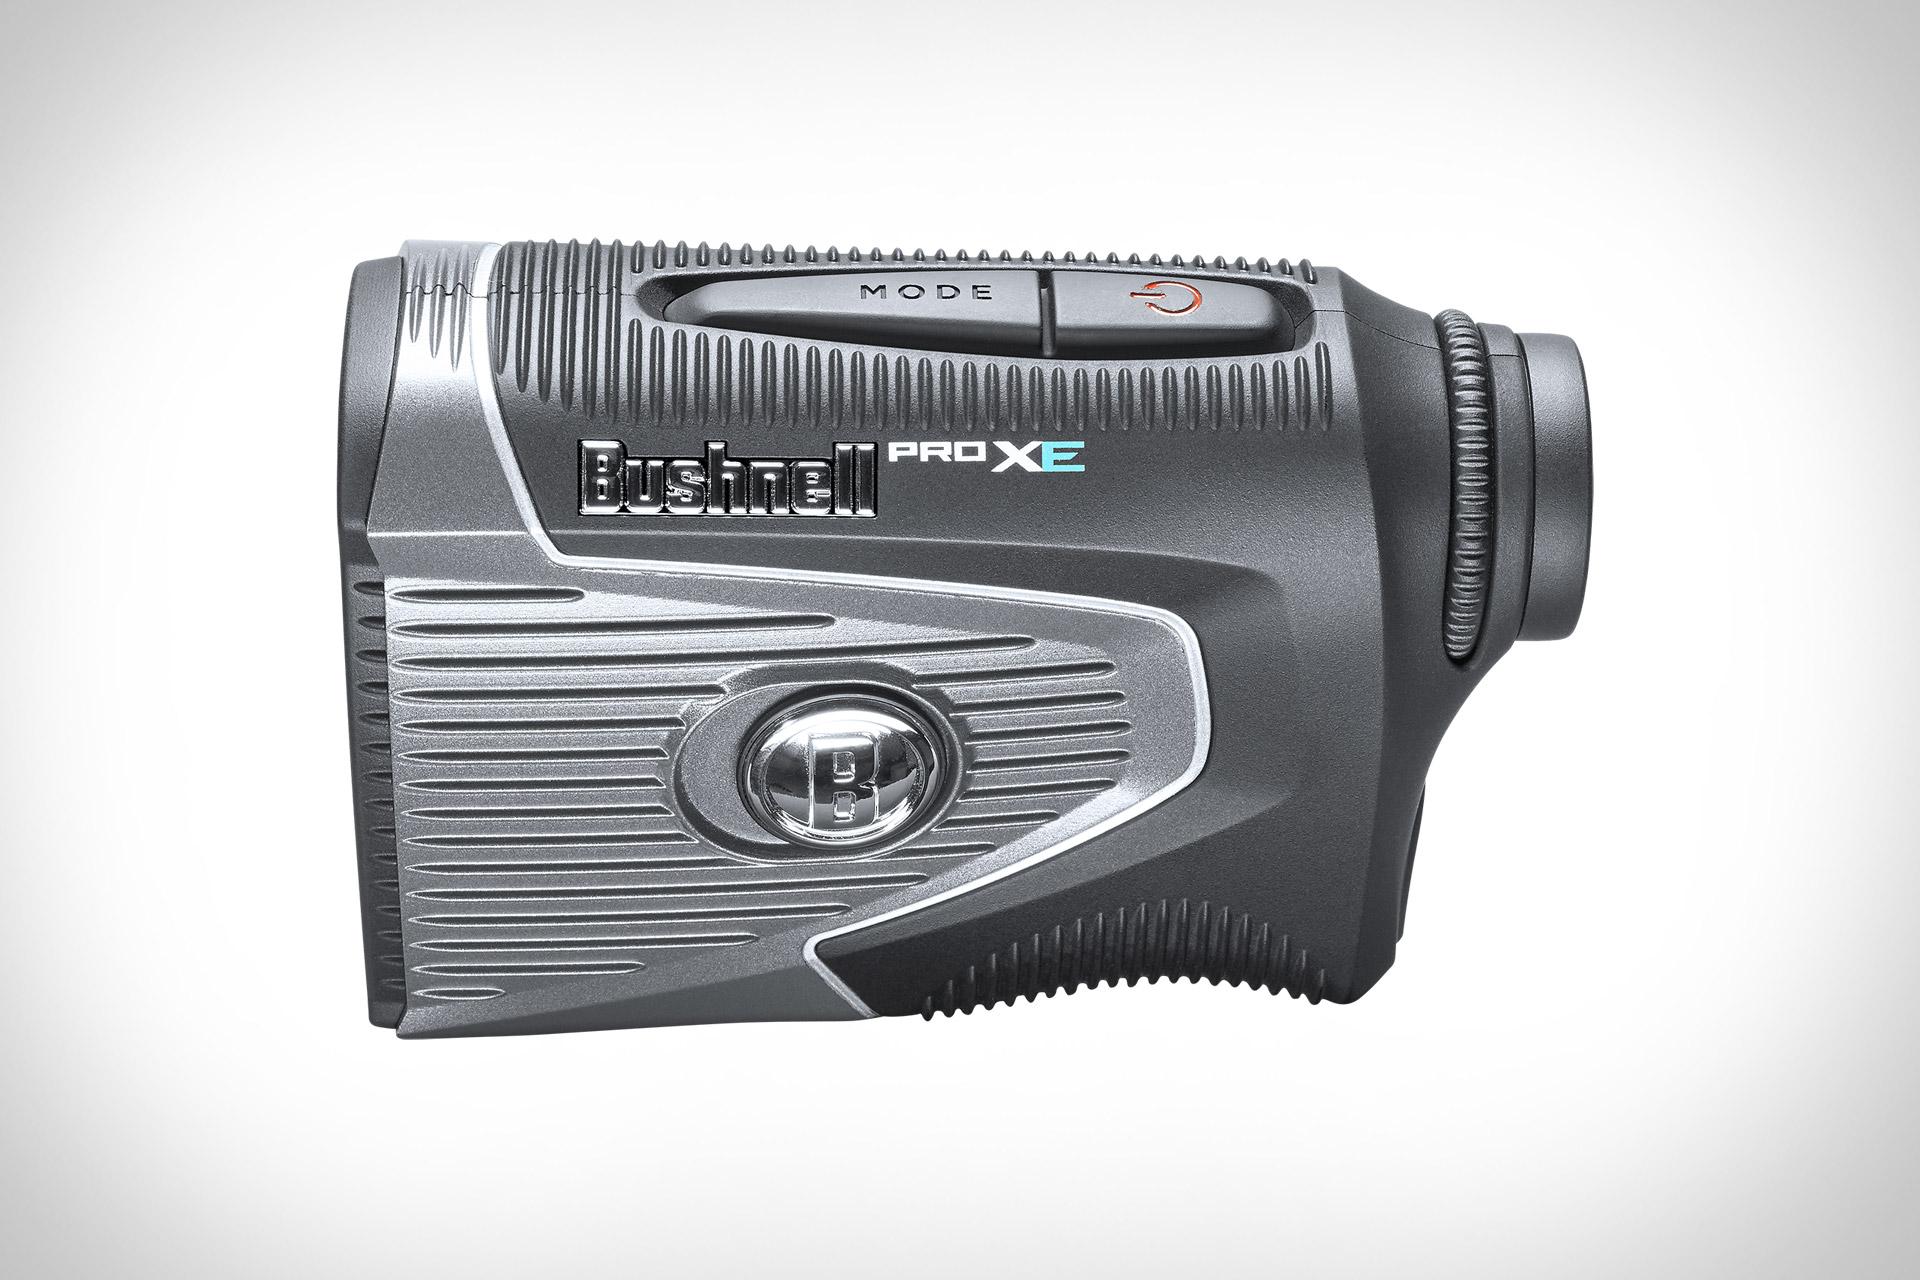 Bushnell pro xe laser entfernungsmesser uncrate